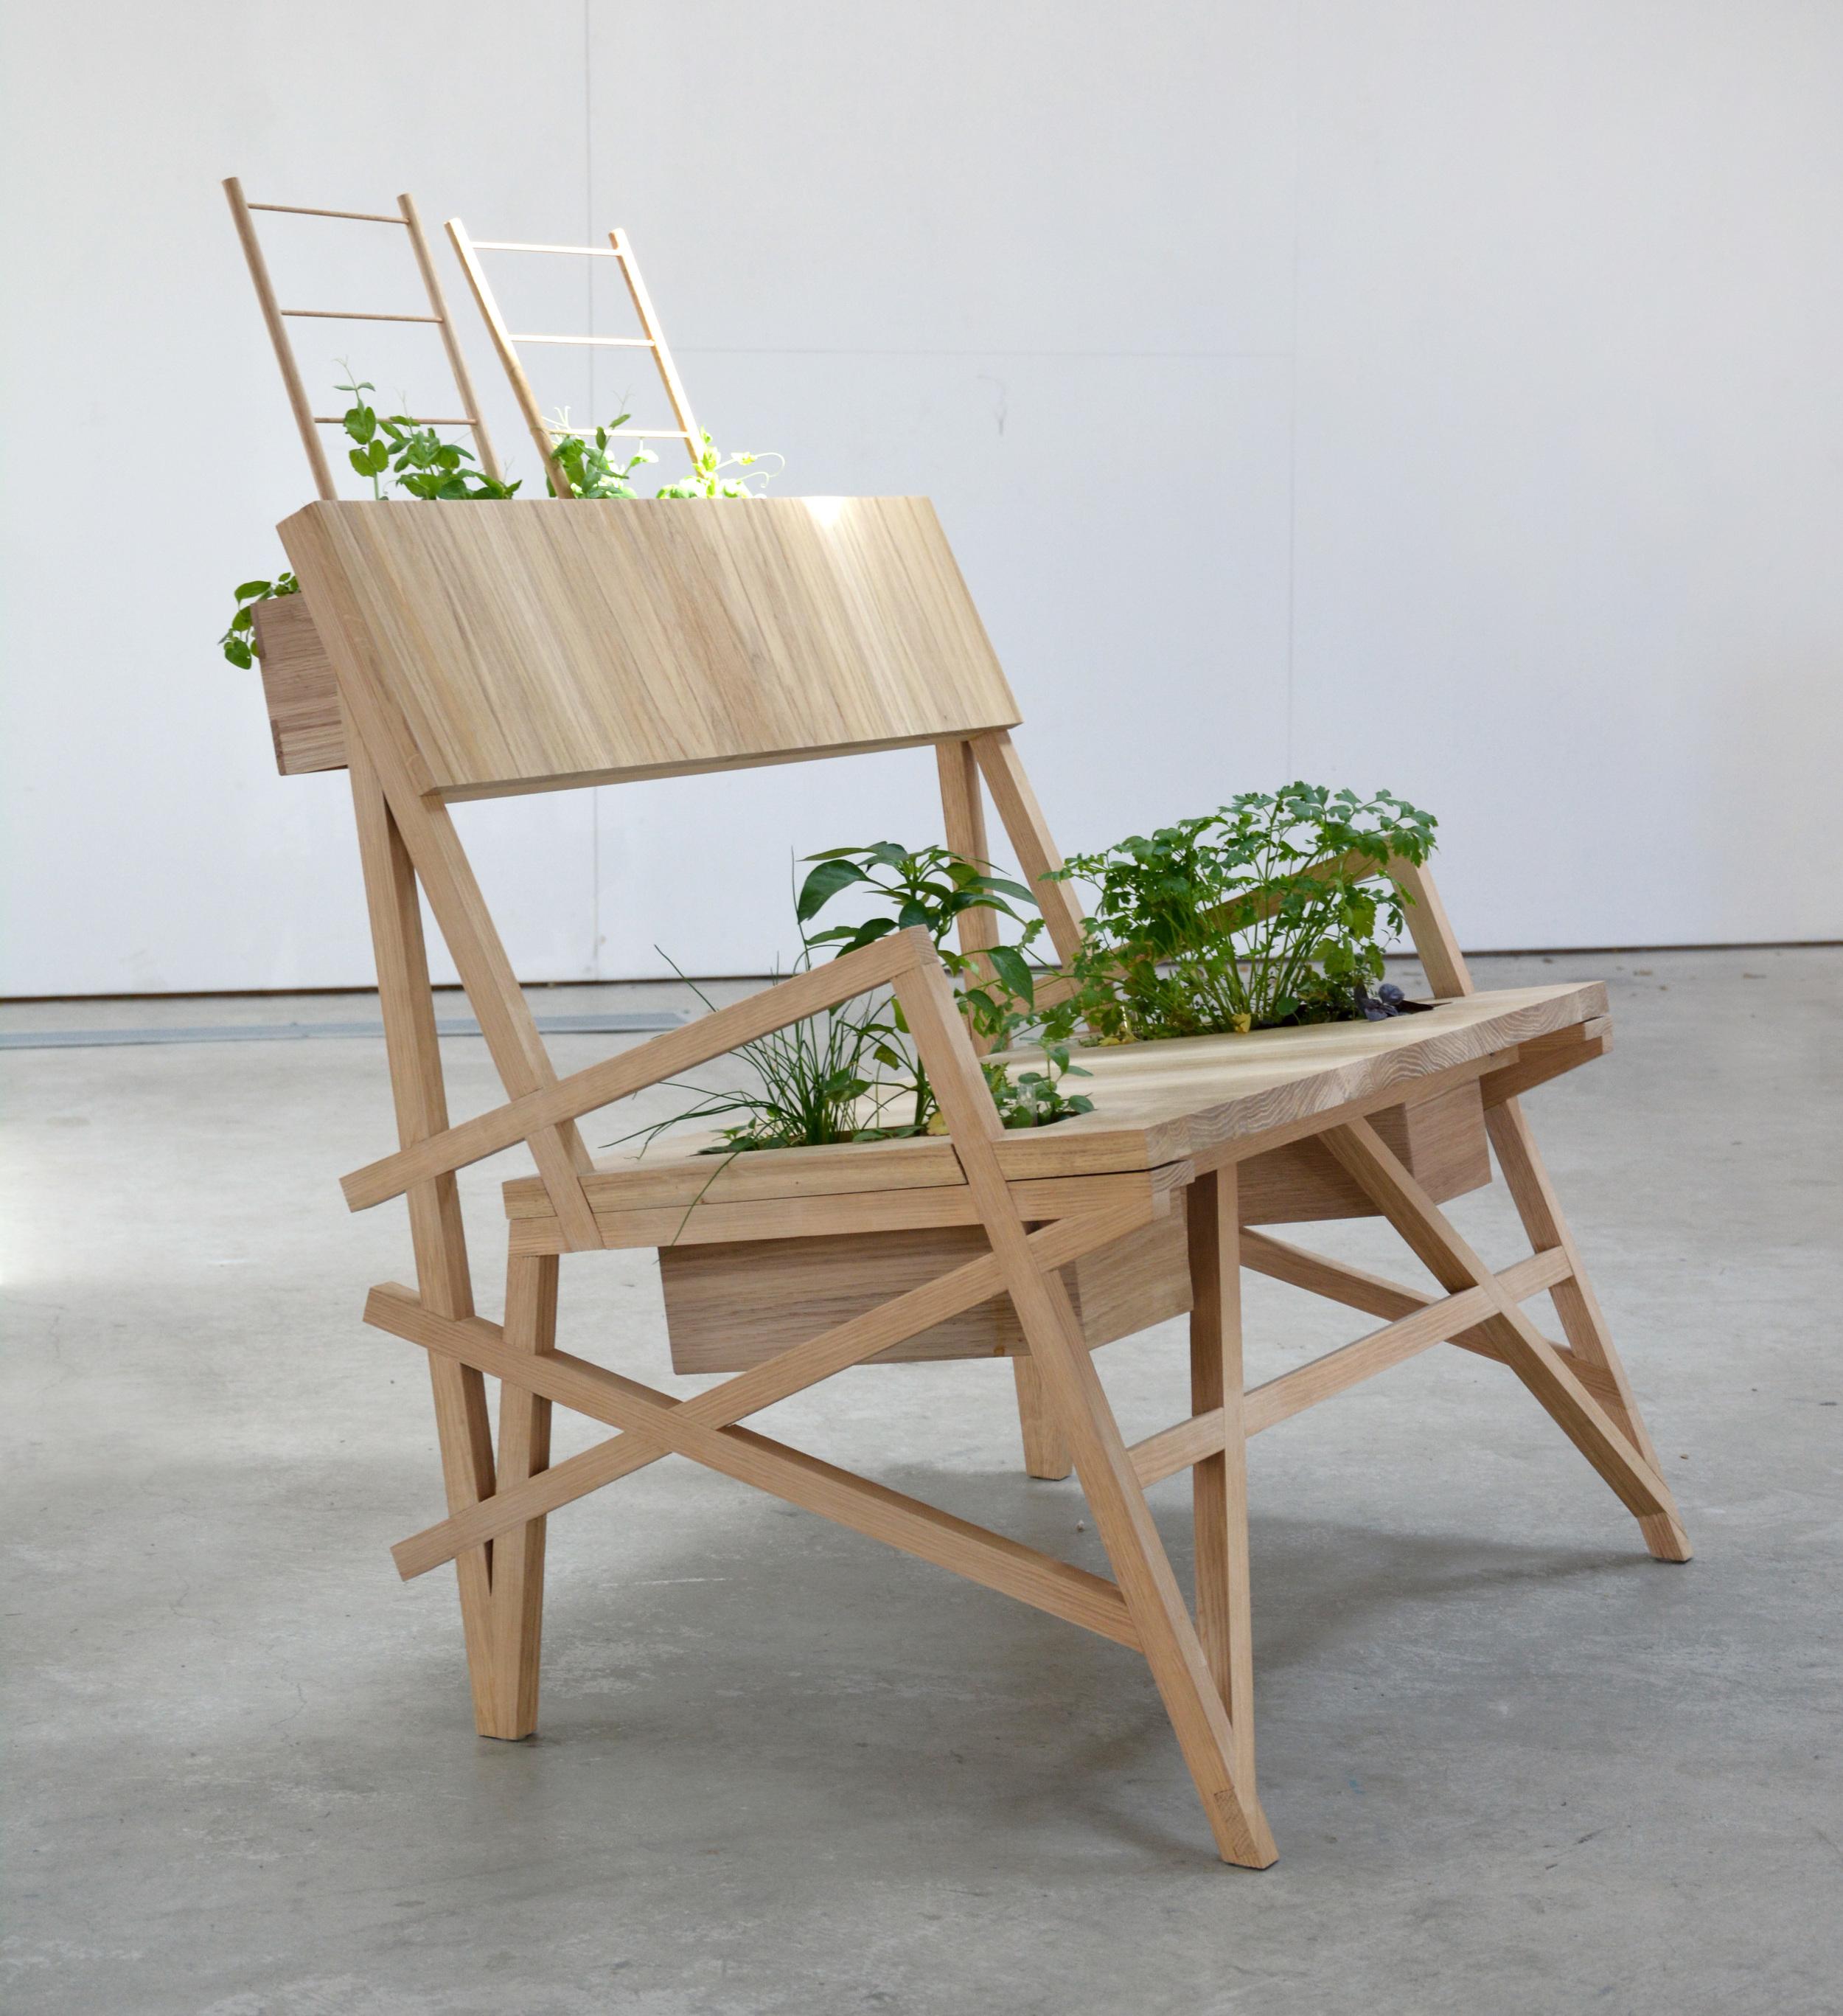 Chelsea lemon furniture design canberra australia plant triangulation Chair